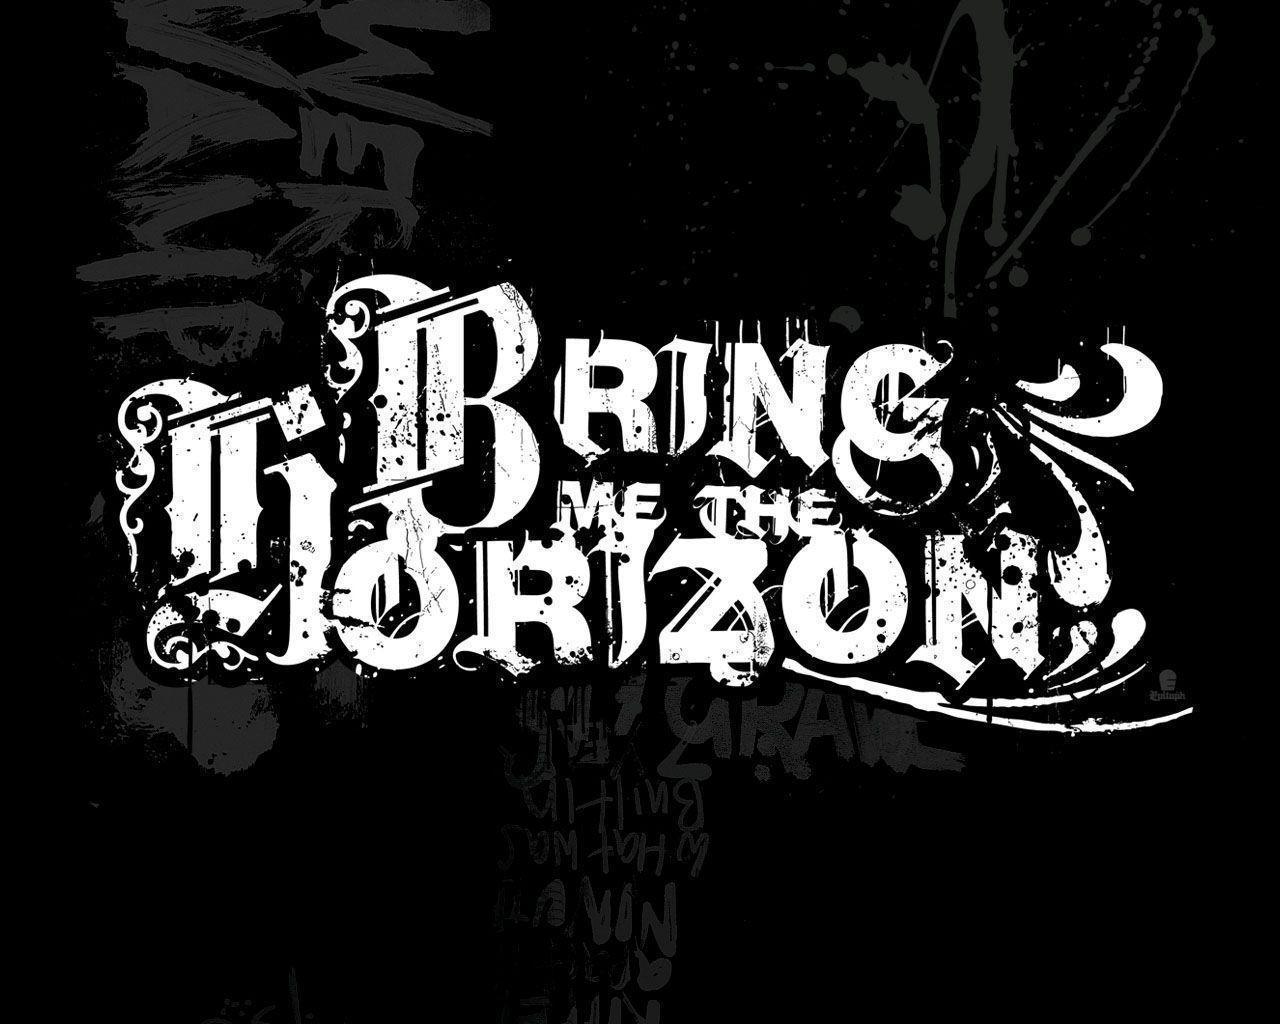 Bring Me The Horizon 2015 Wallpapers